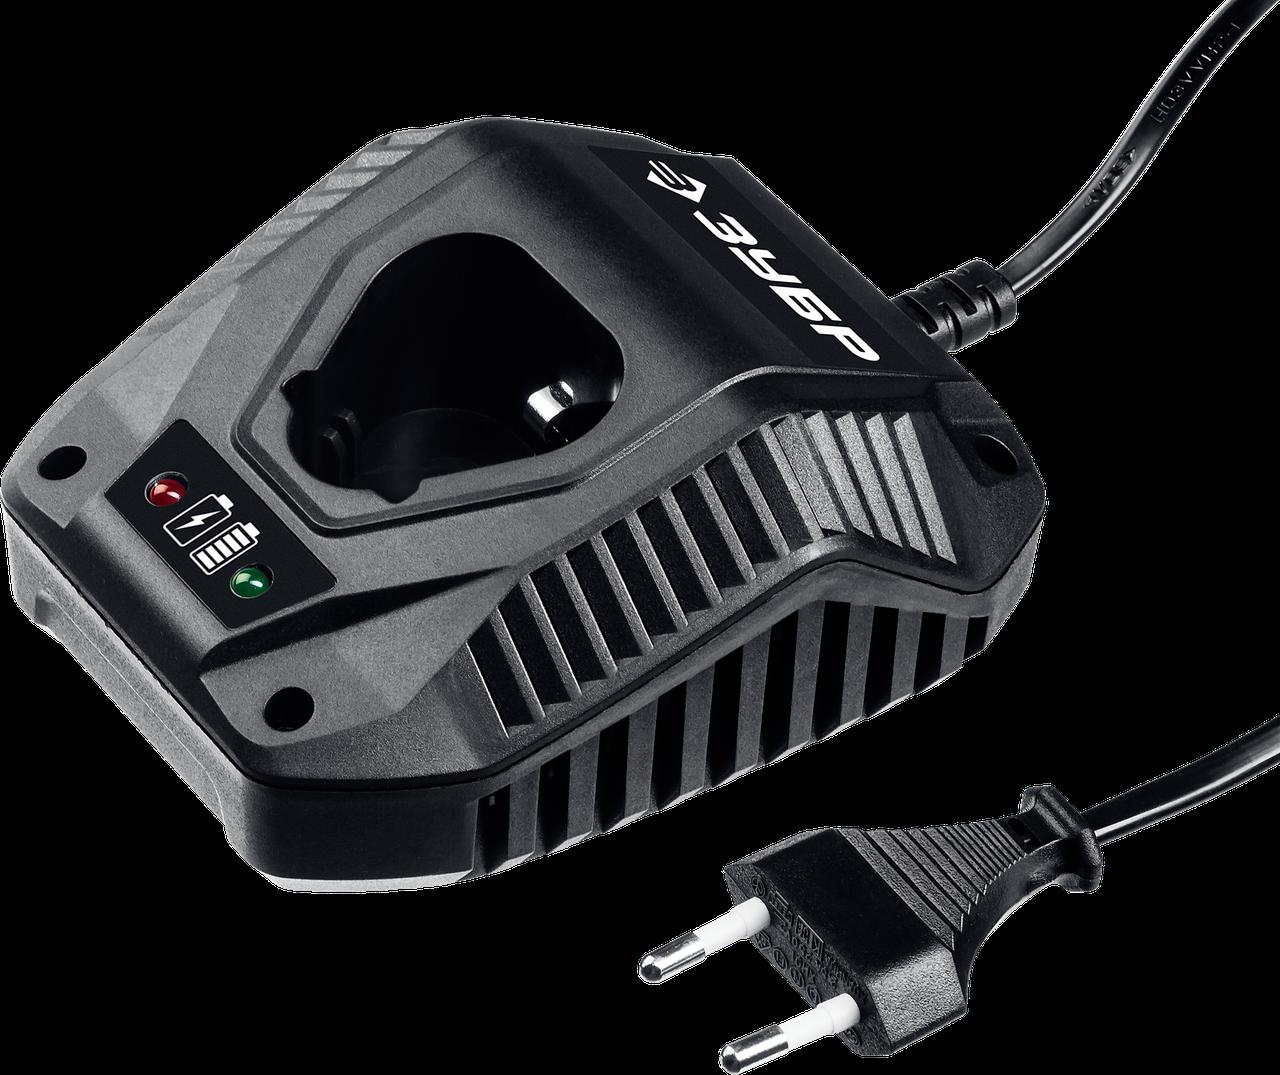 БЗУ-12 С1 Зарядное устройство 12 В, 1.8 А, для Li-Ion АКБ, ЗУБР